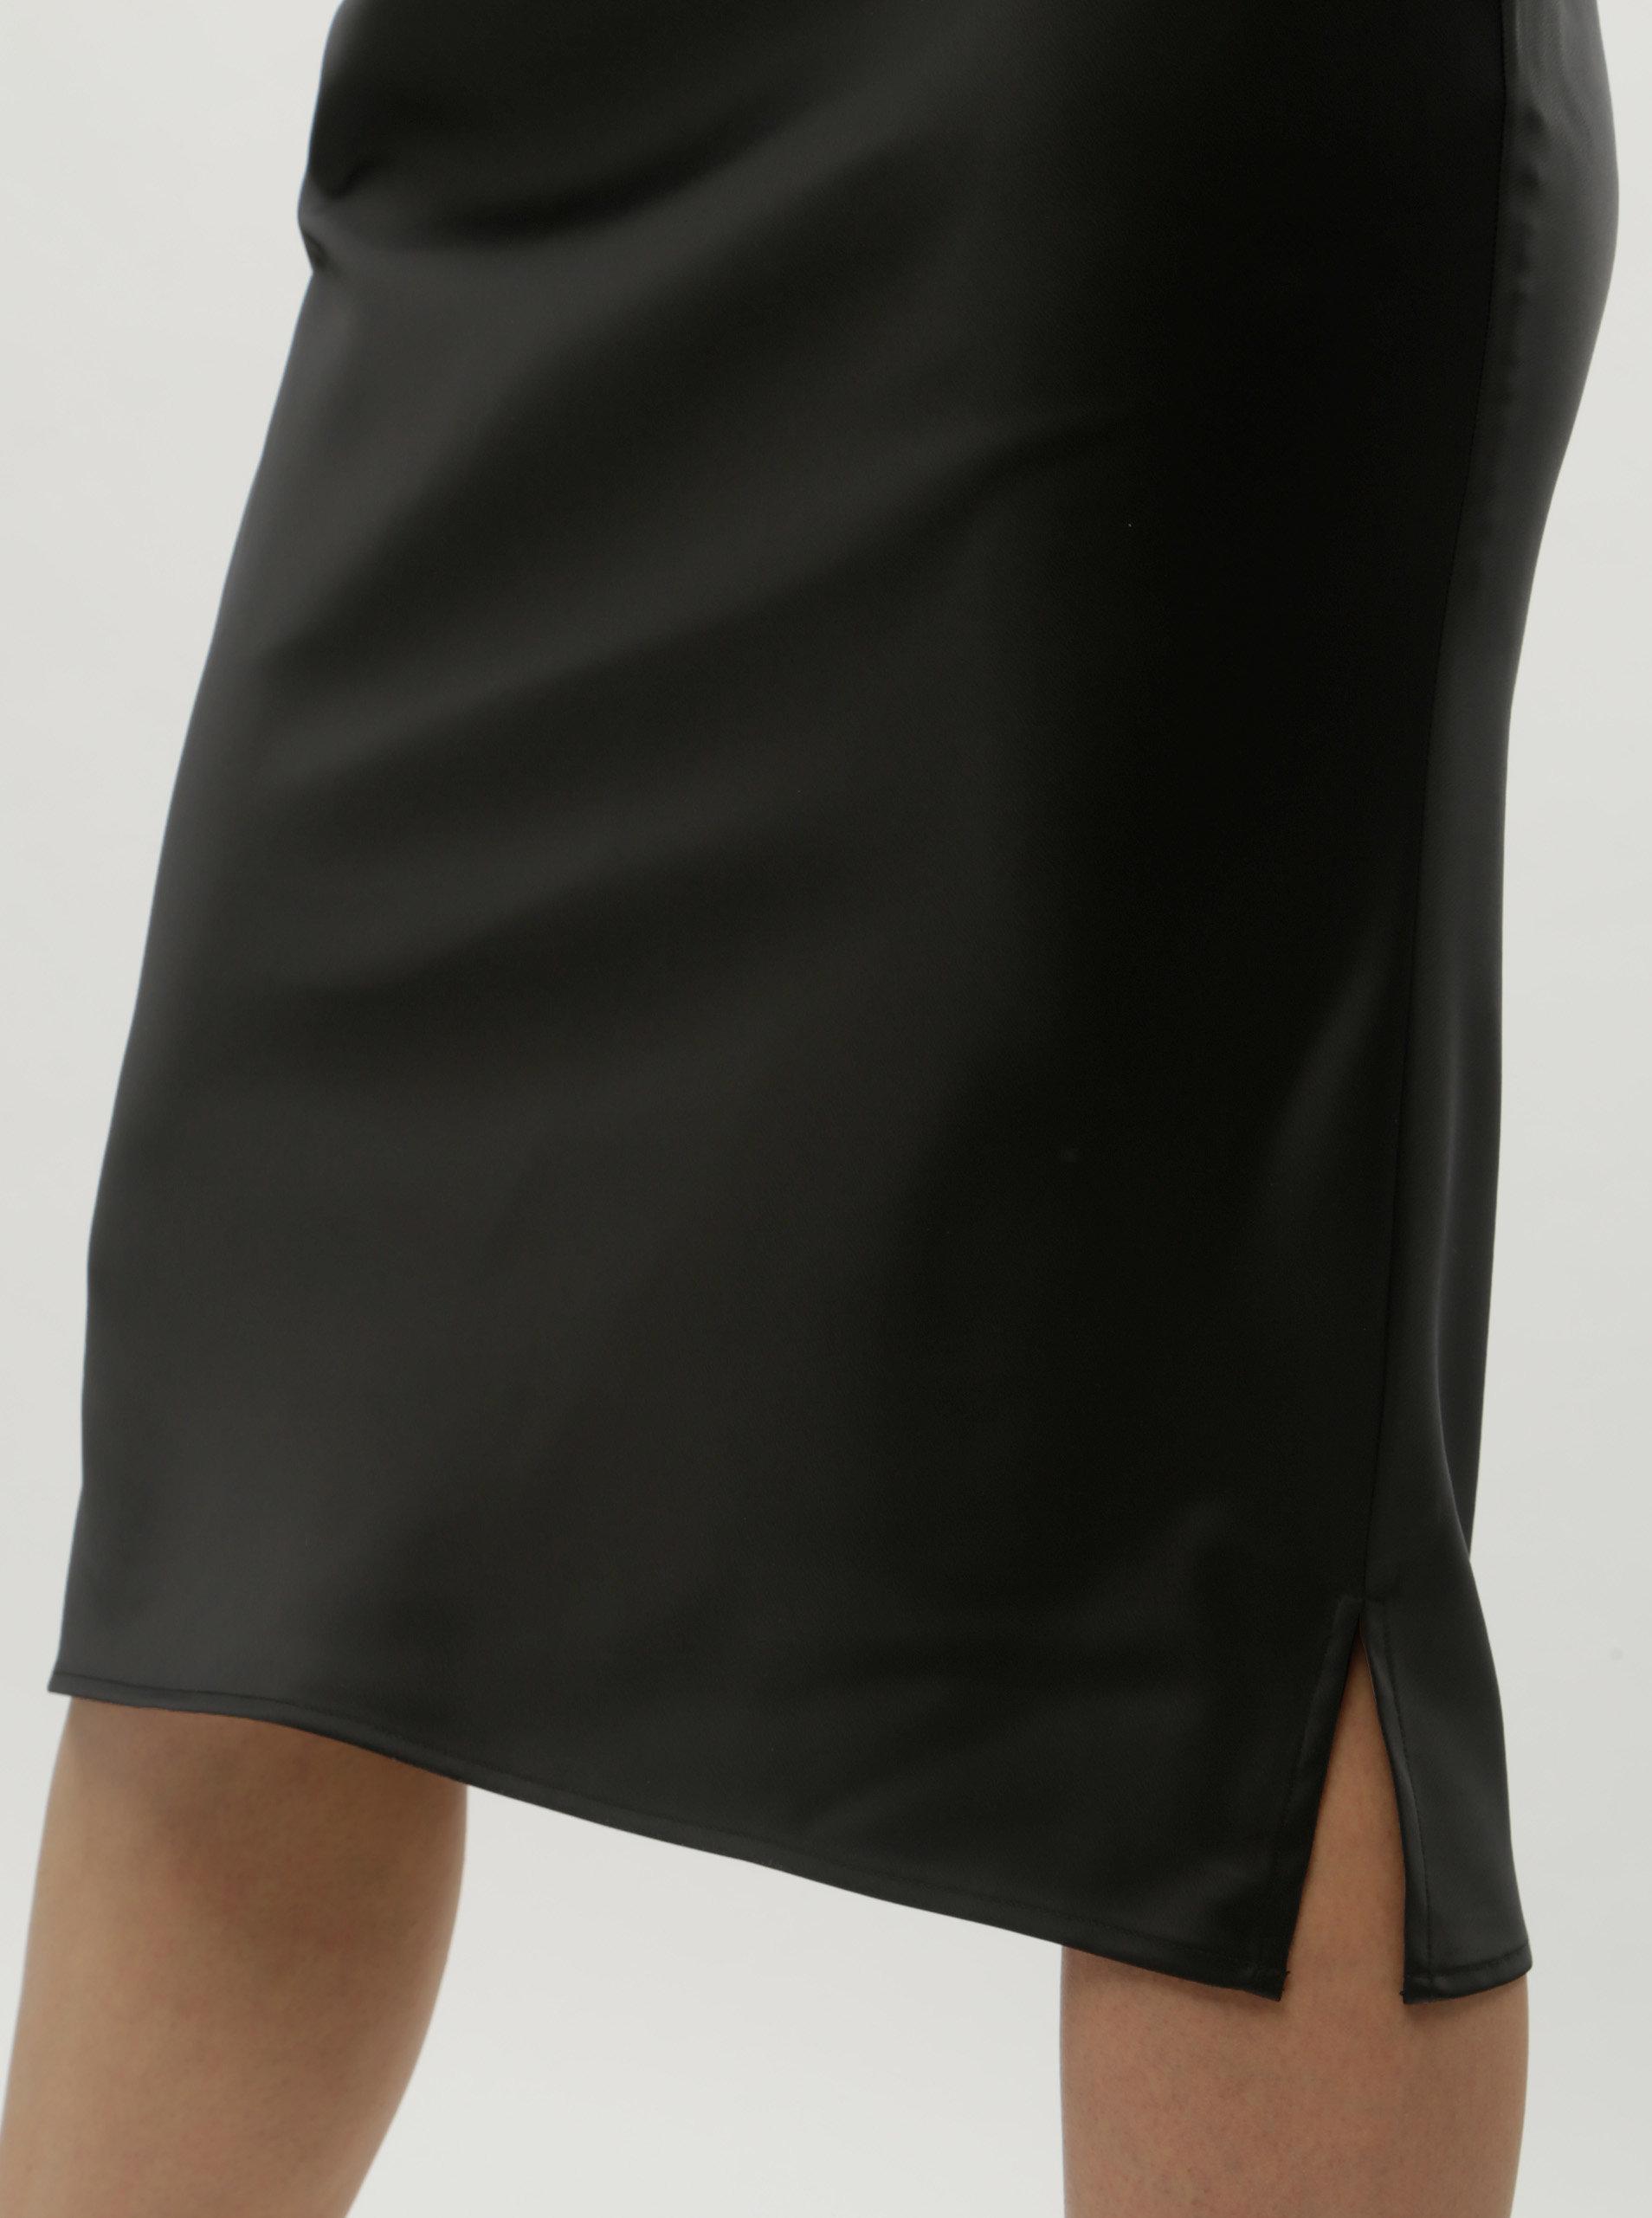 a8ed701a09b8 Černá sukně s gumou v pase VERO MODA AWARE Ginger ...